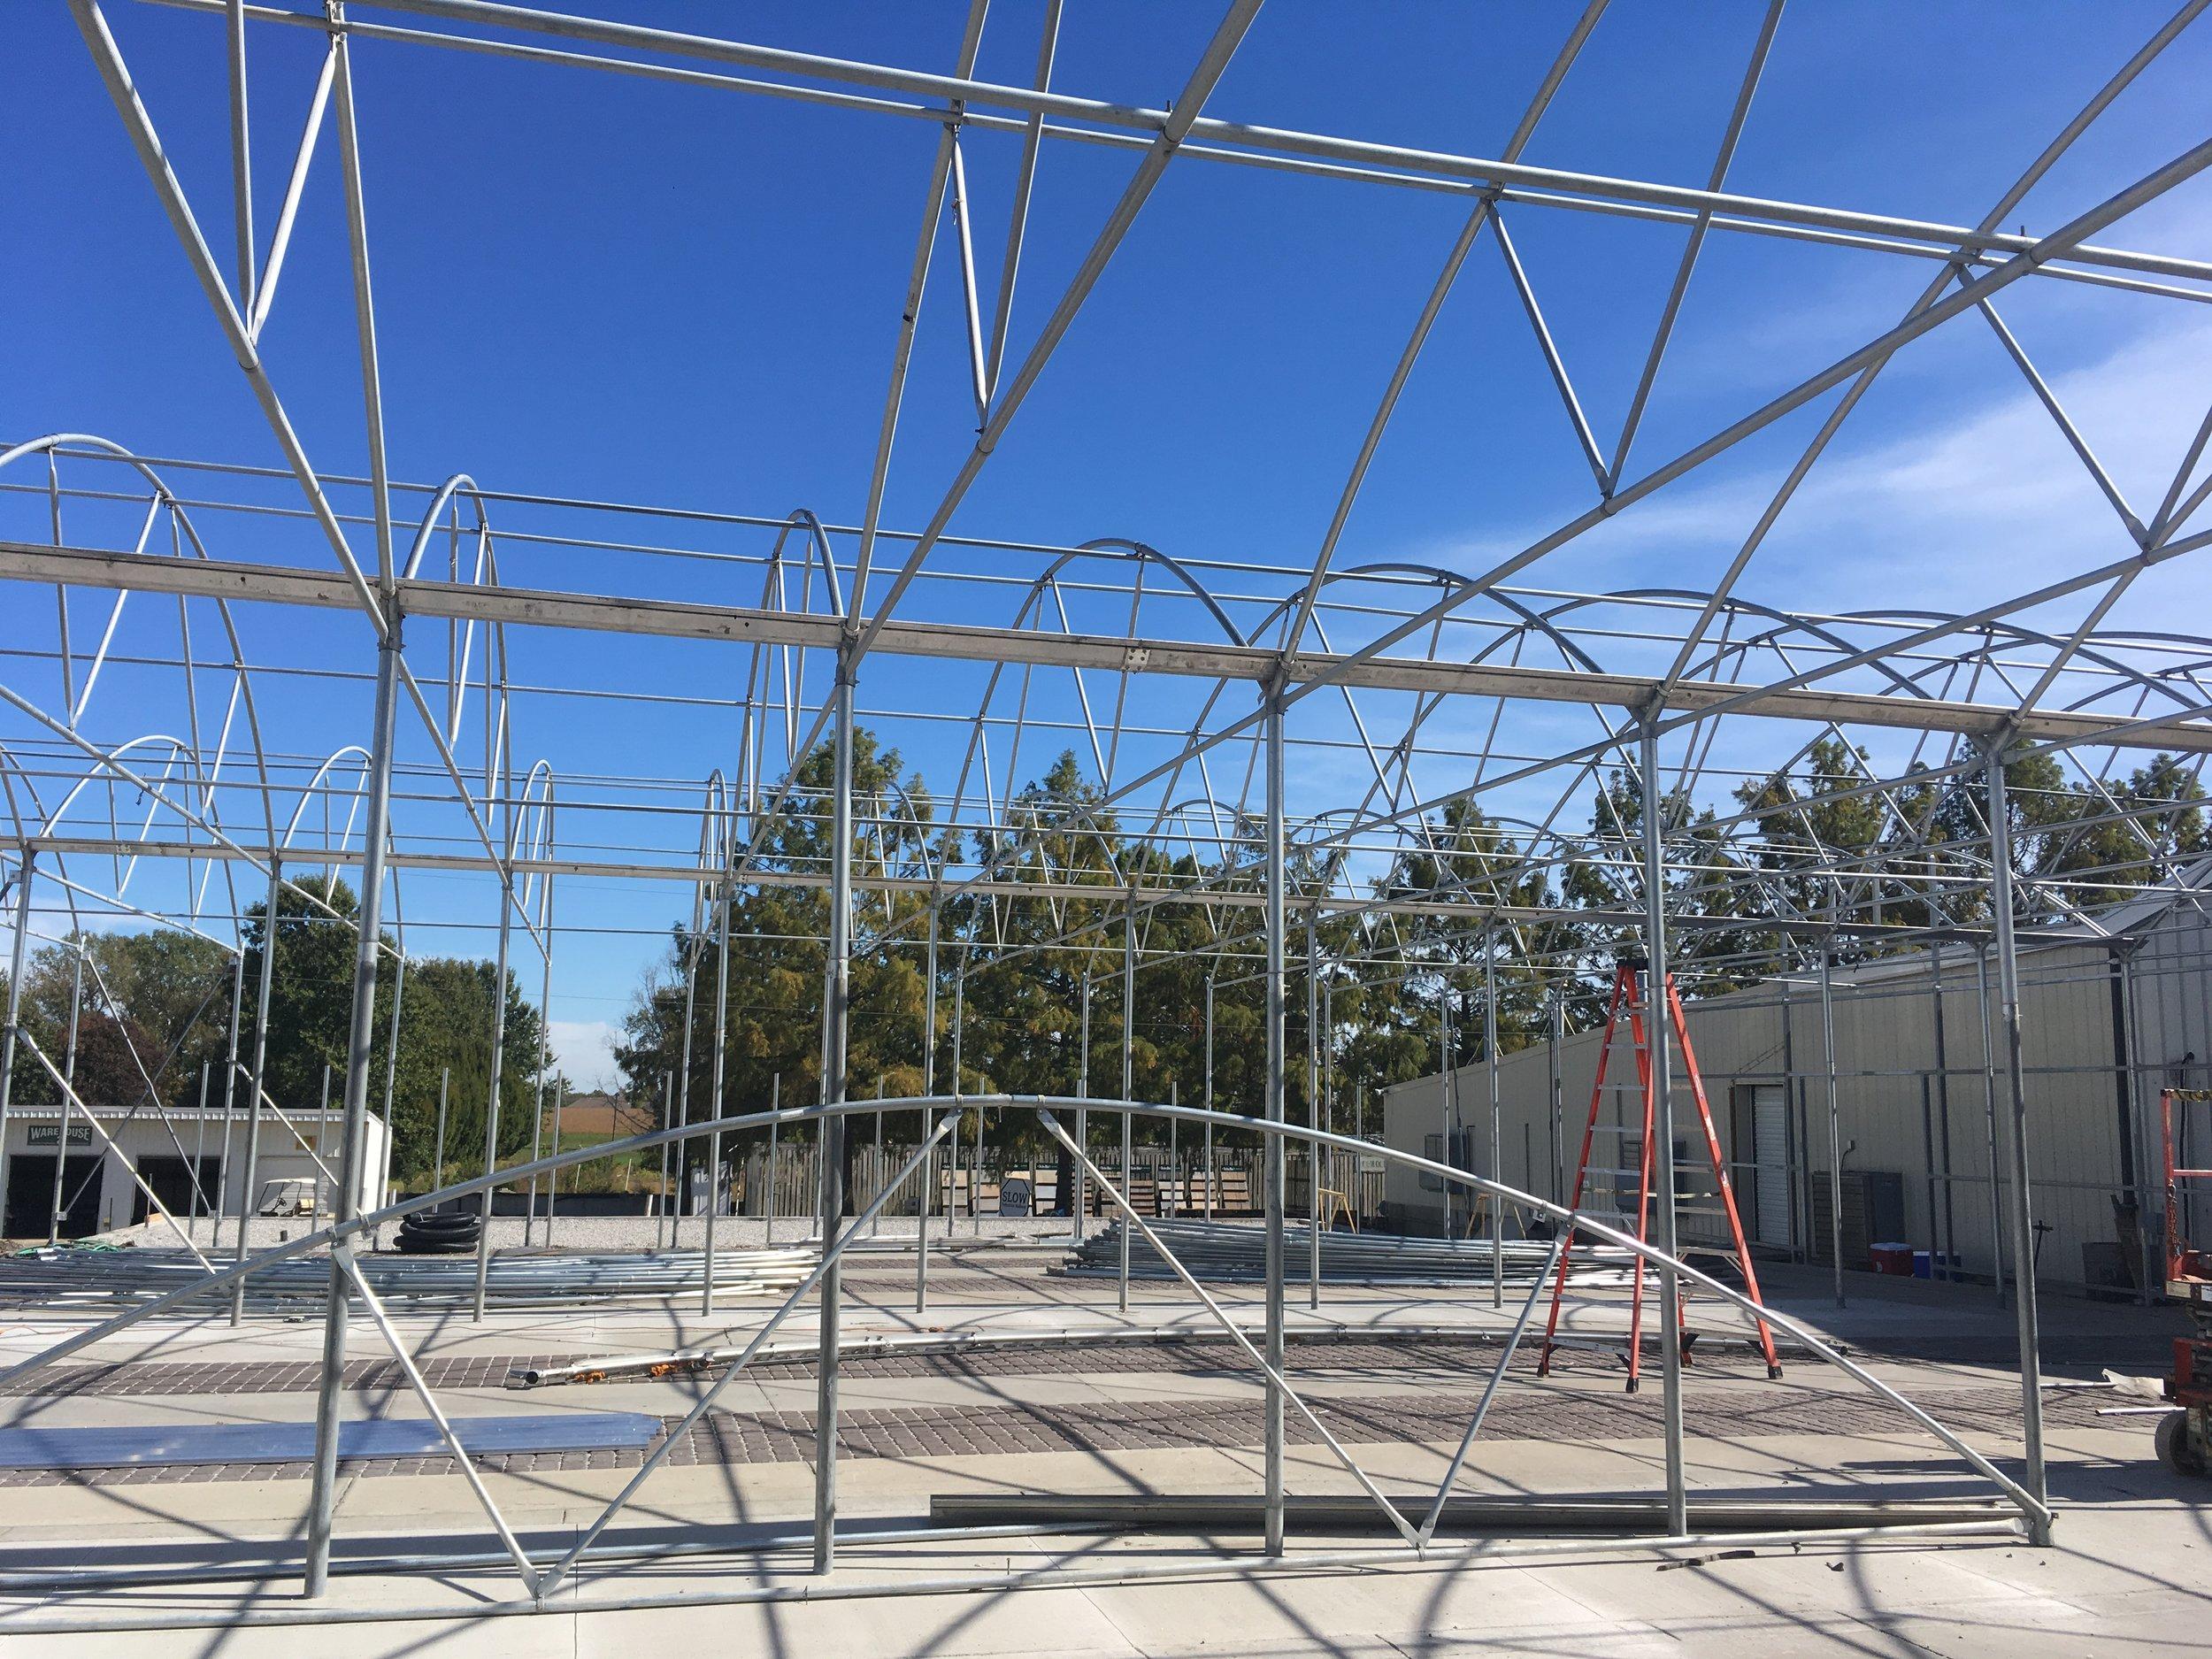 greenhouse-construction-1054-3-16-15.jpg